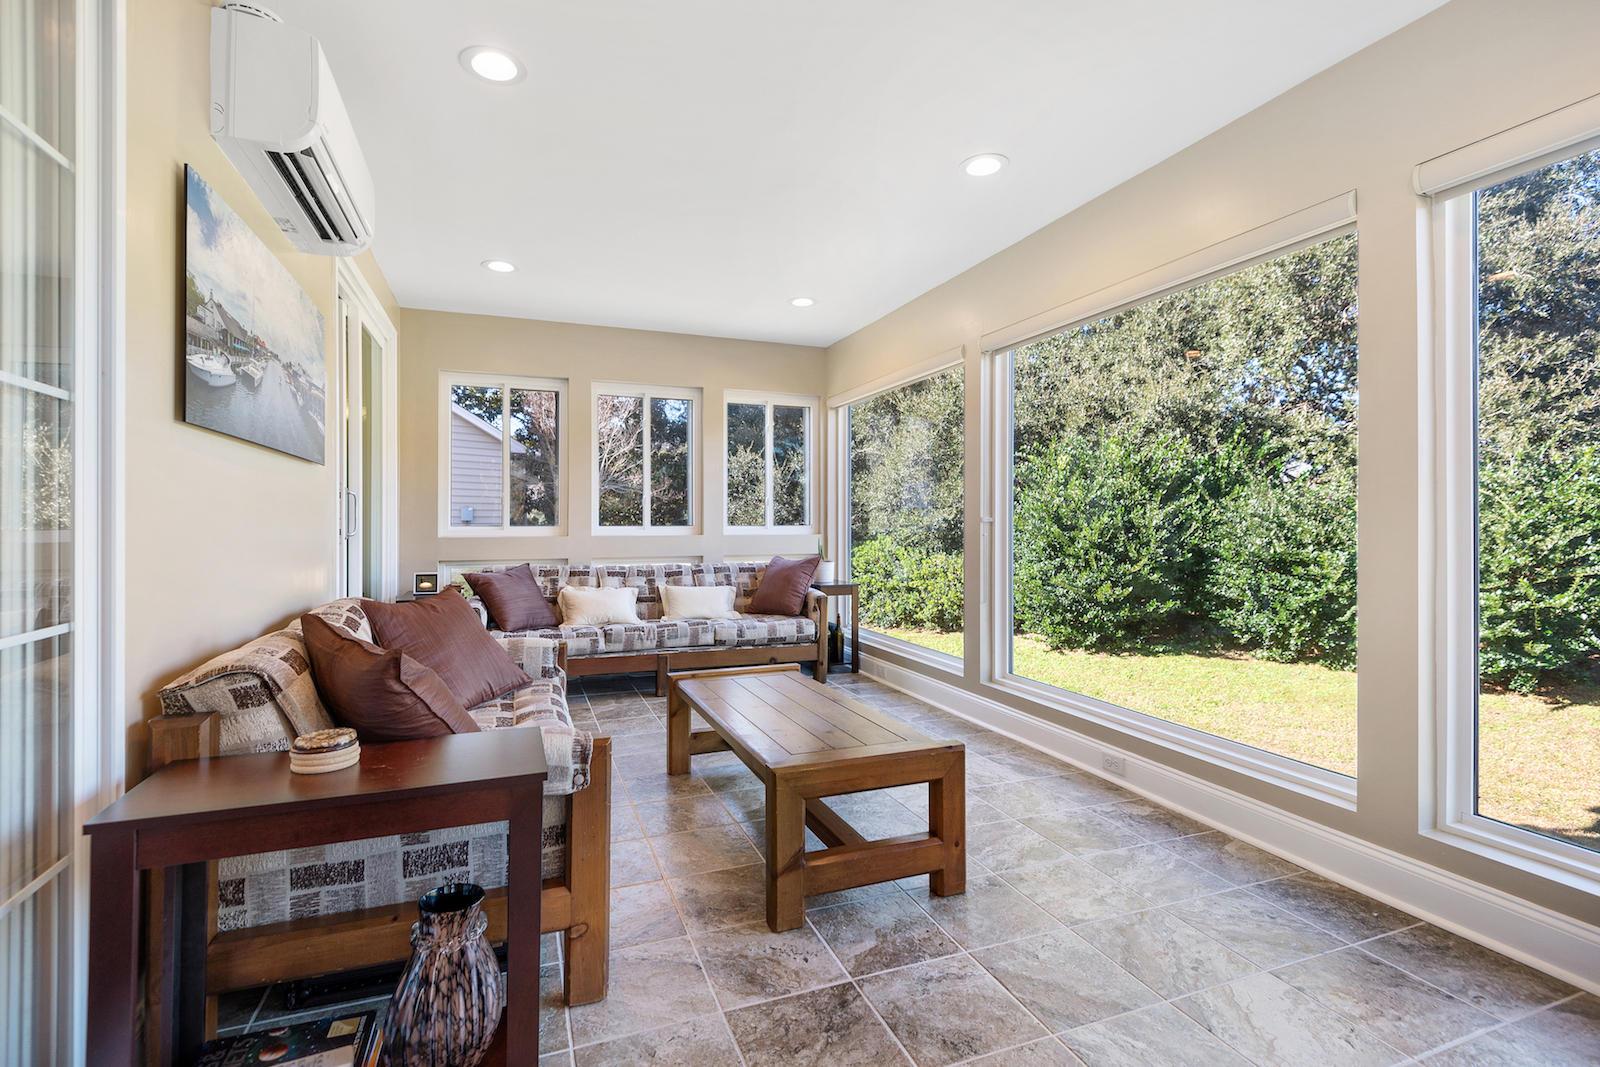 Belle Hall Homes For Sale - 195 Revetment, Mount Pleasant, SC - 0